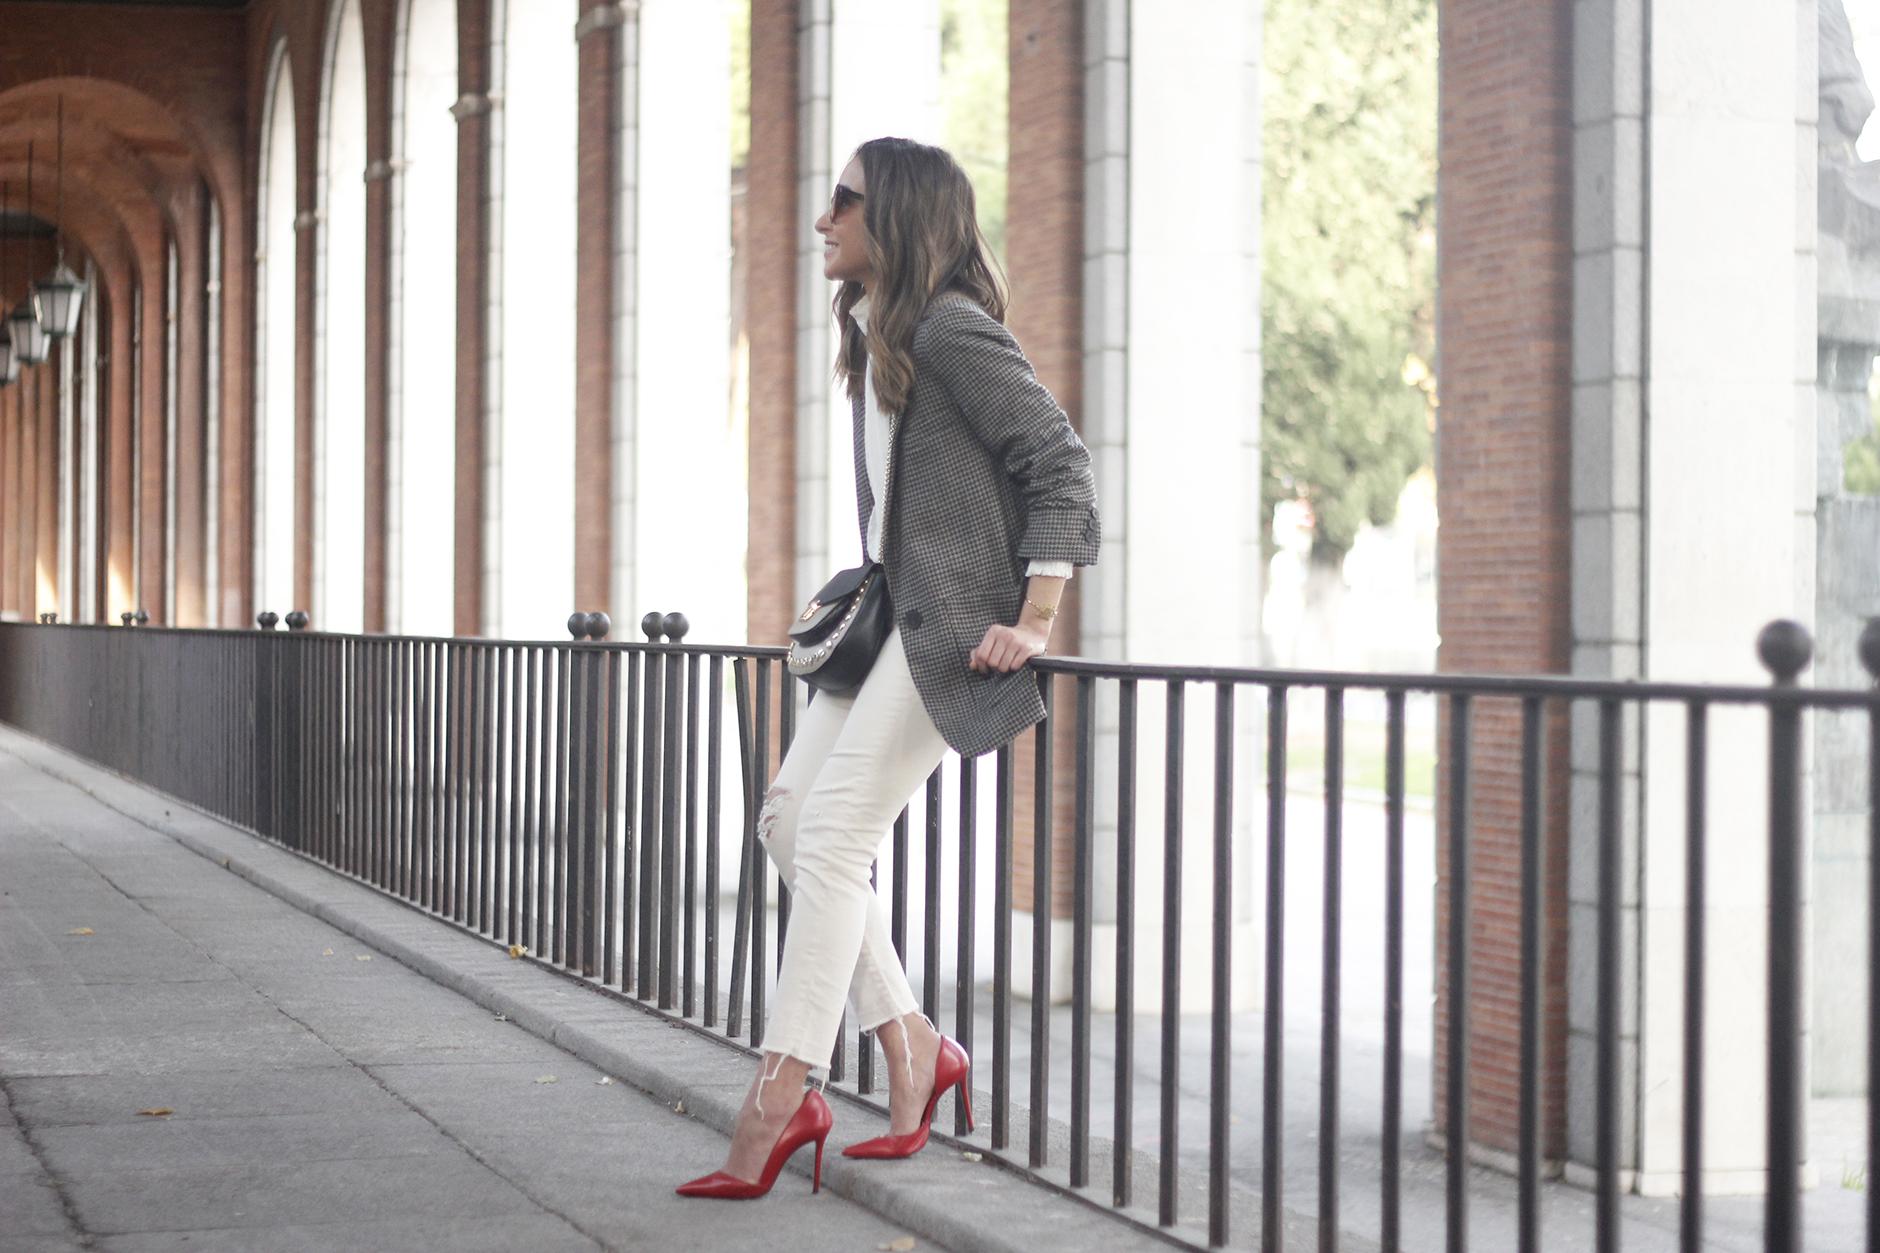 Plumeti blouse houndstooth blazer white jeans outfit style streetstyle07